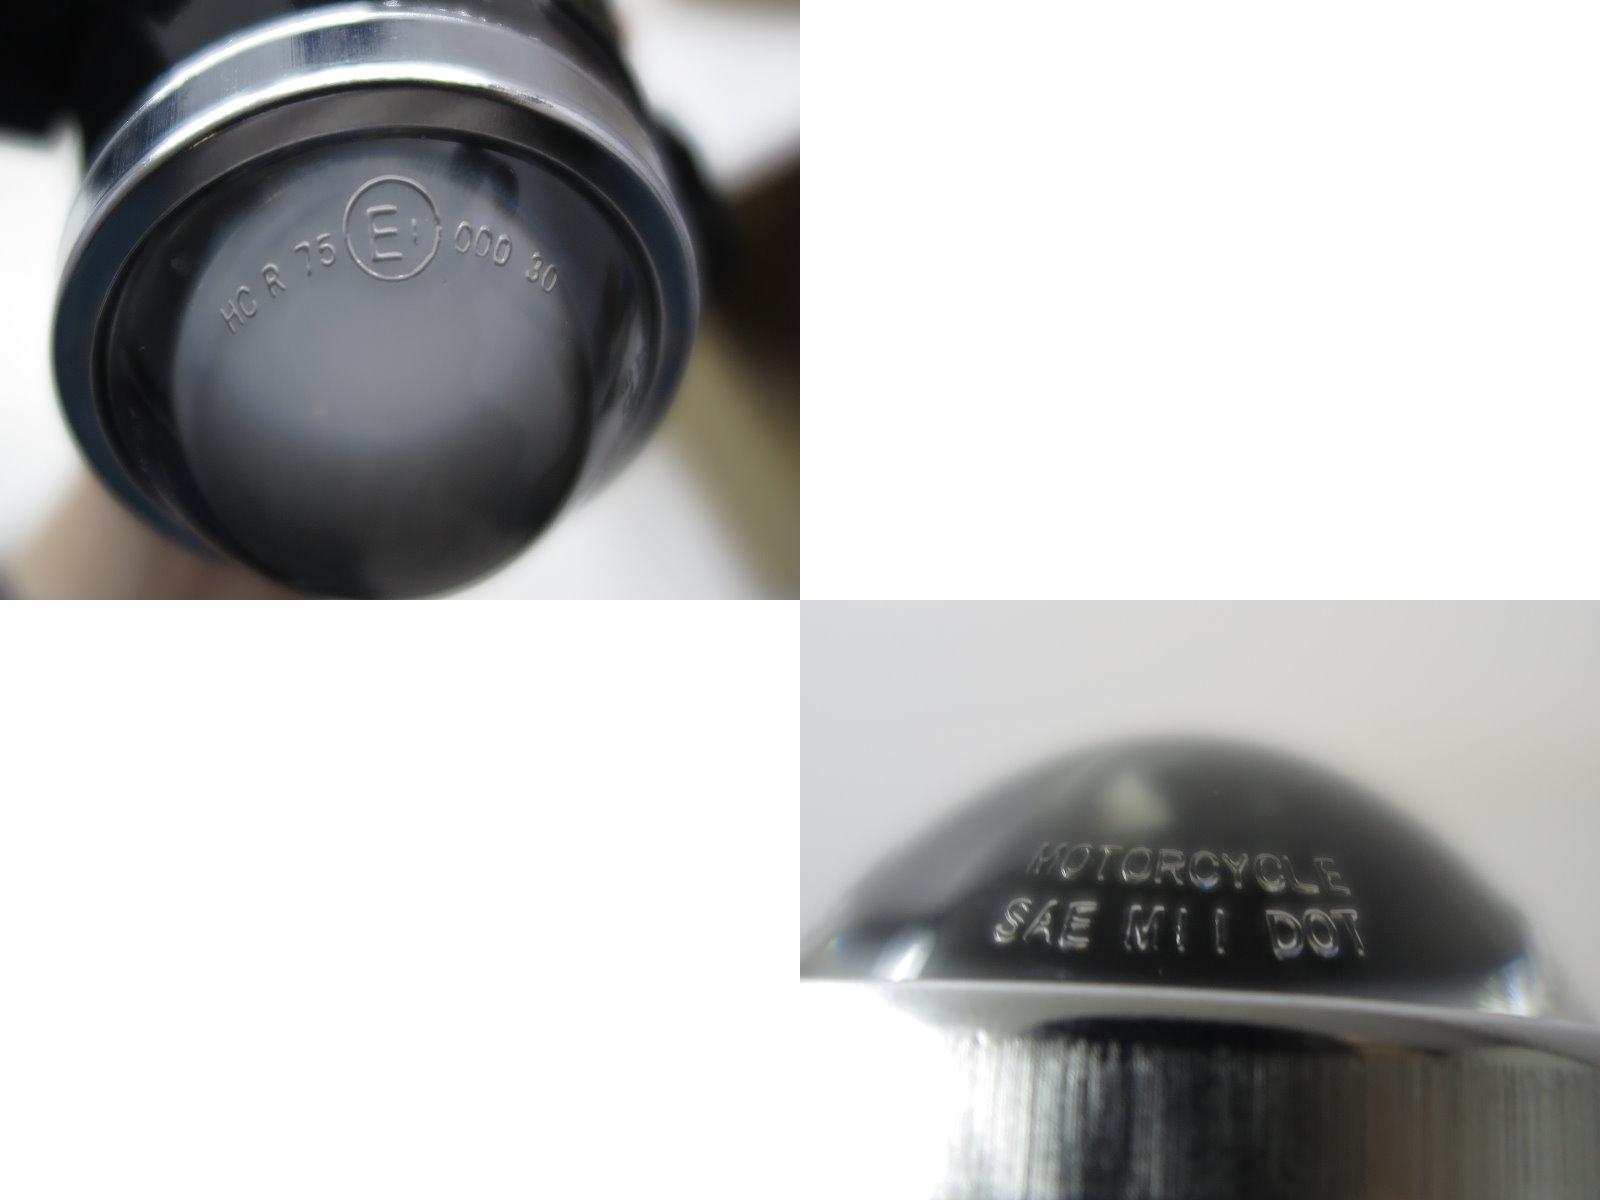 thumbnail 6 - VERSA N17 Second generation 2012-2019 Sedan Projector Fog Light Black for NISSAN